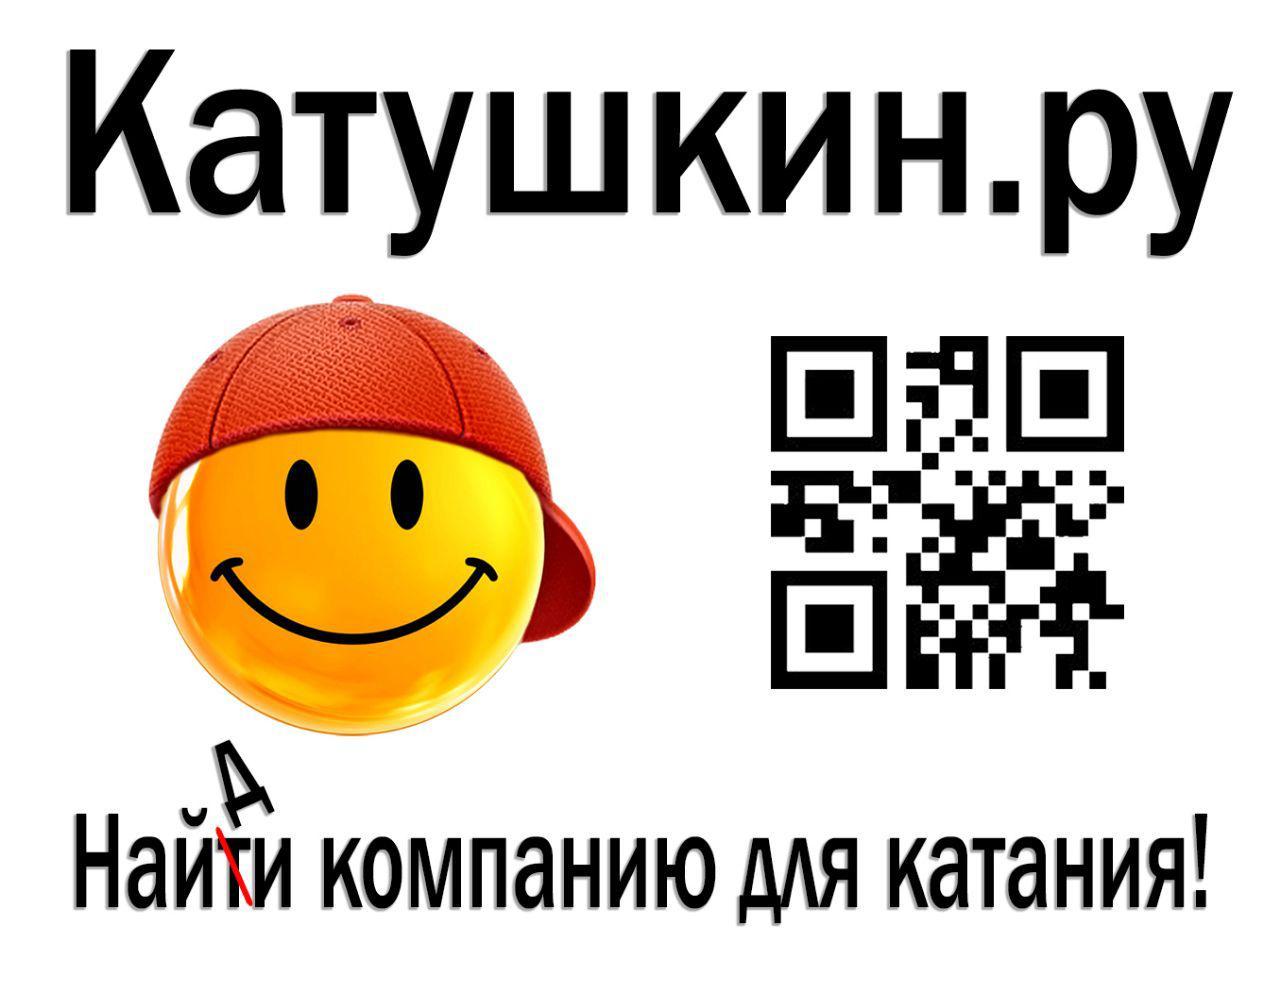 https://pp.userapi.com/c851432/v851432967/158c6f/UbeSPa-uwRg.jpg